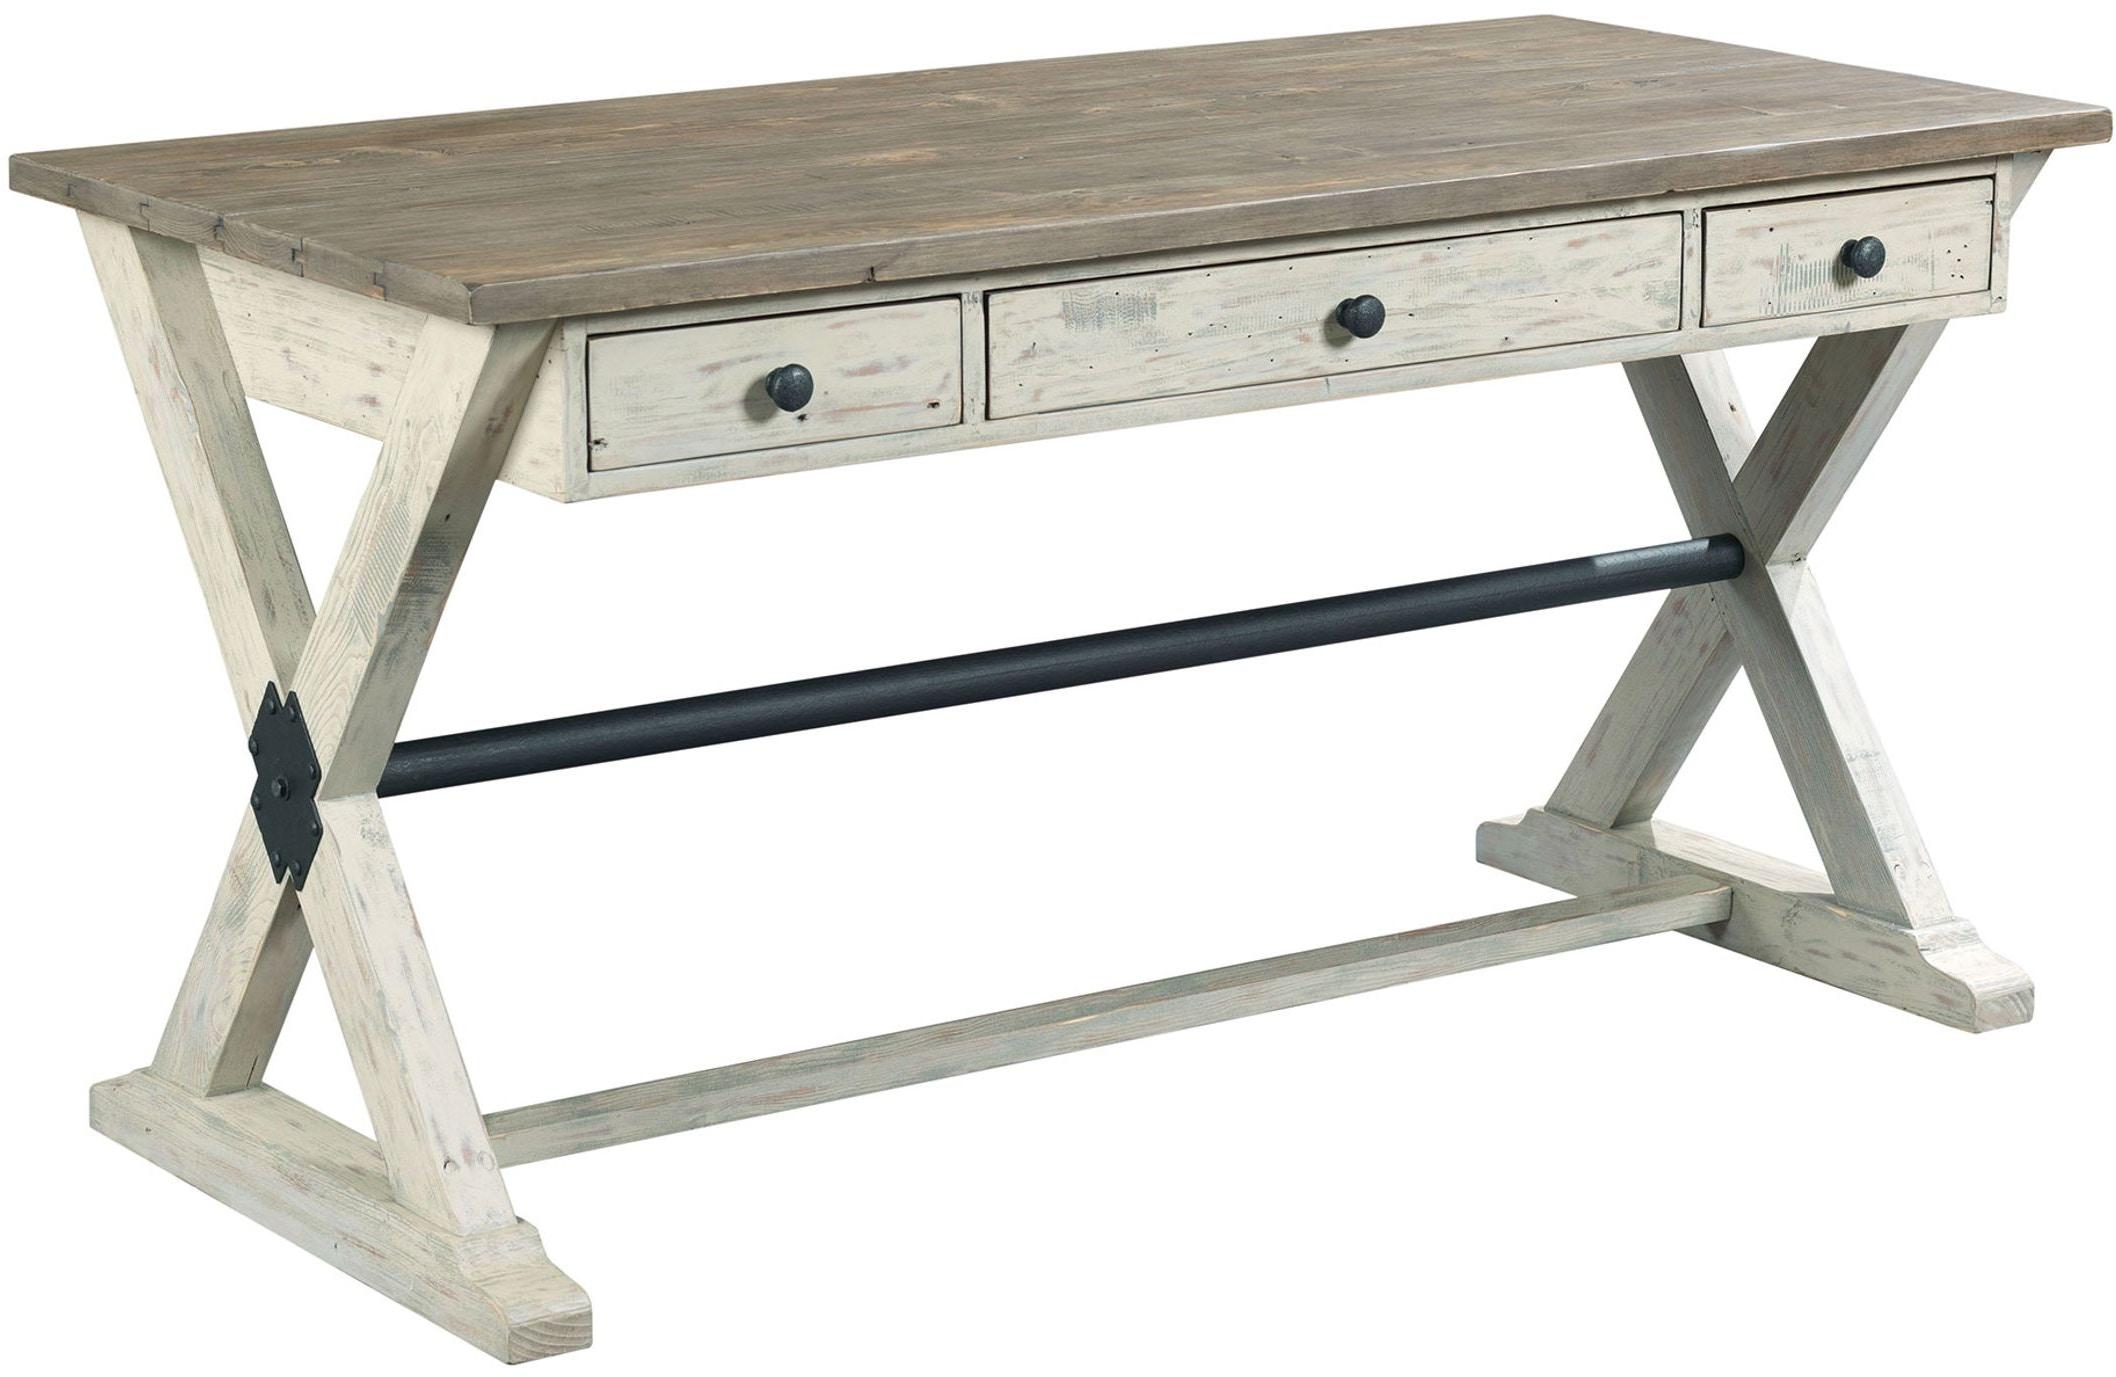 New Hammary Home Office Trestle Desk 523-940 - Carol House Furniture  AO04